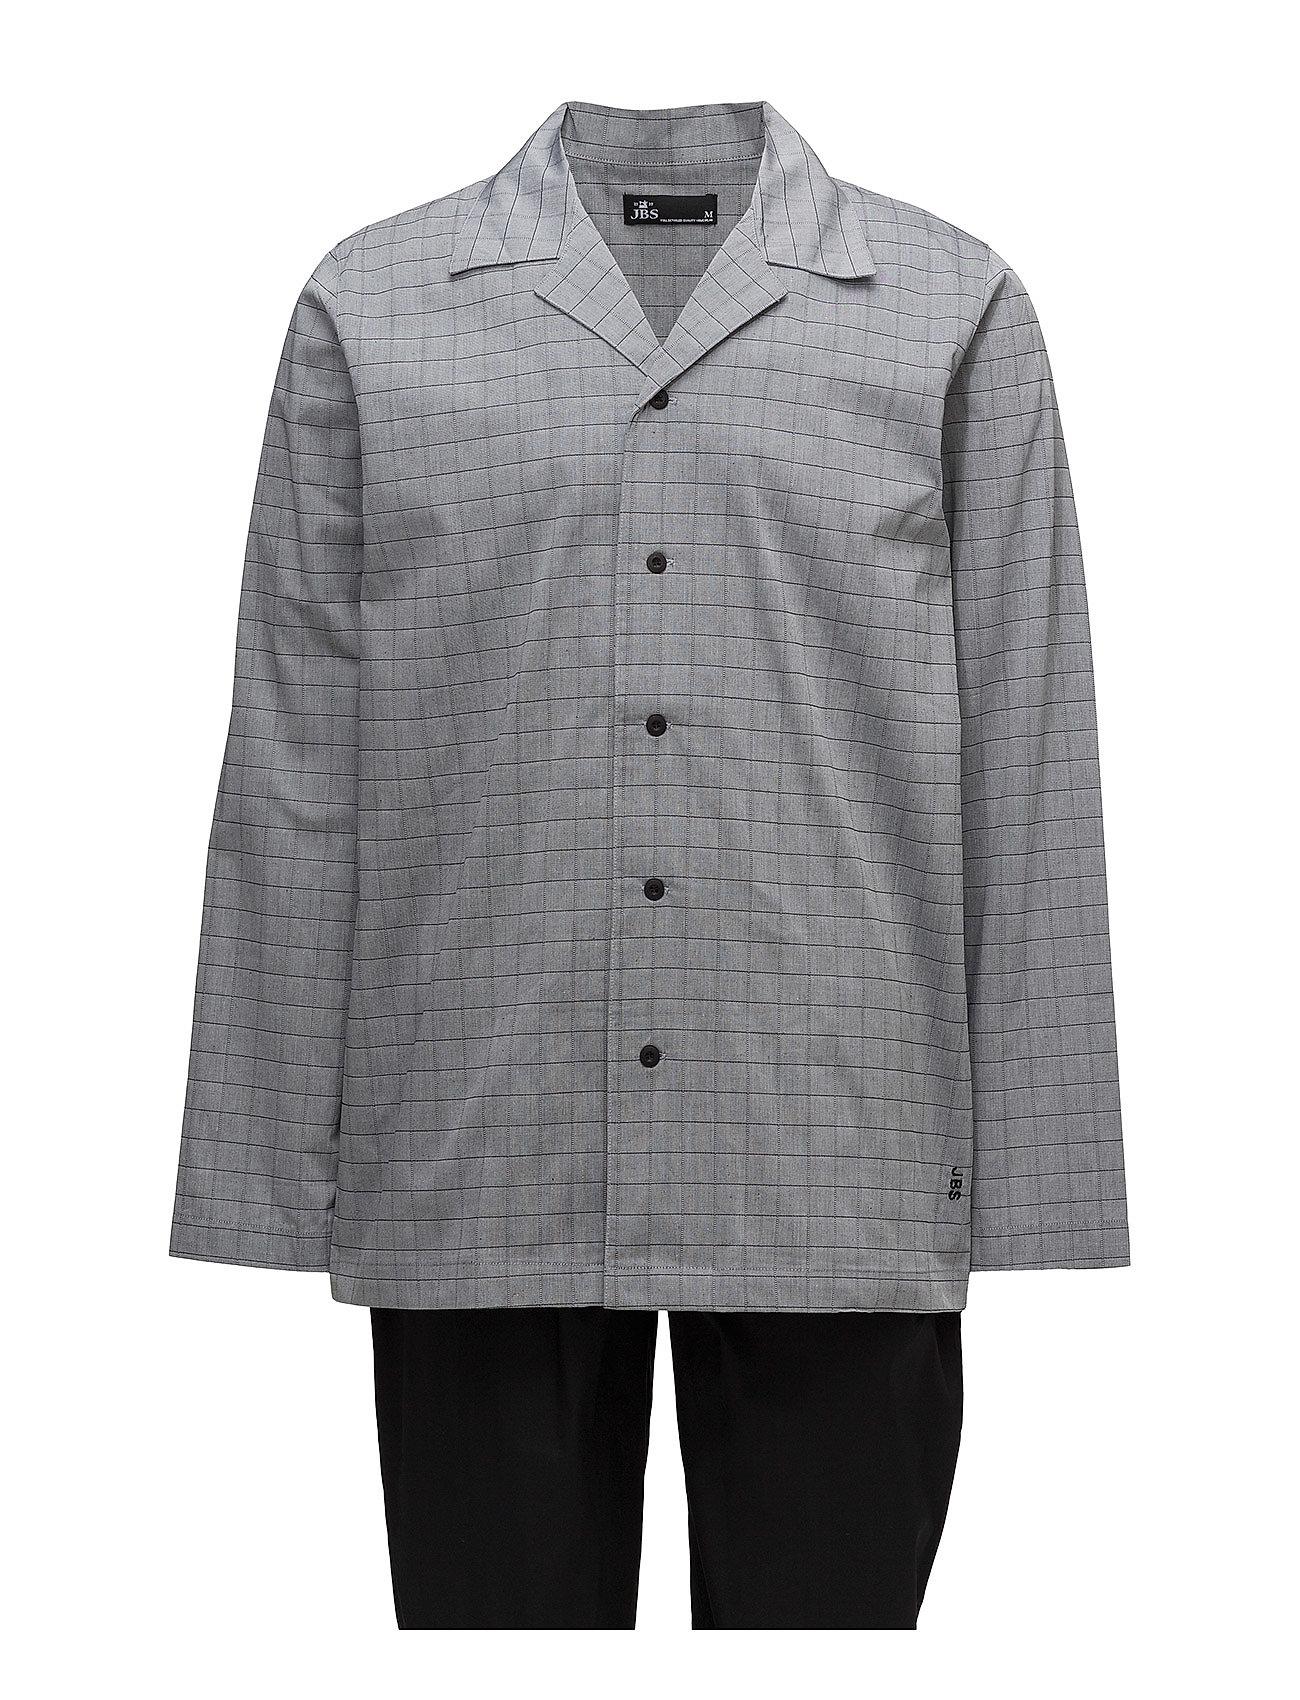 JBS JBS, pajama button down - BLACK